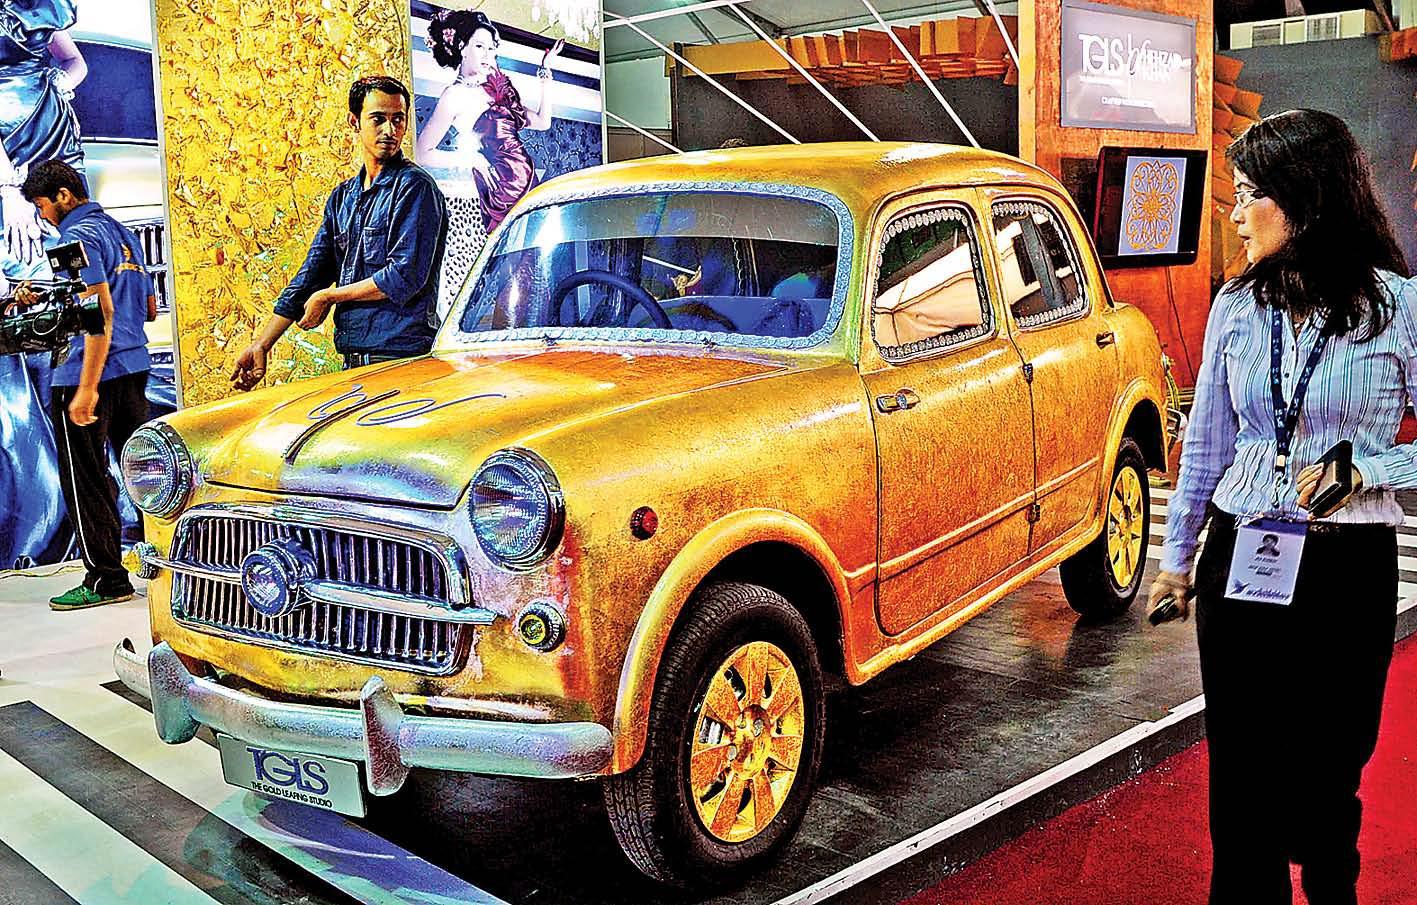 Puputupu Rose Gold Car A 1947 Fiat Dukkar Model Is On Display At